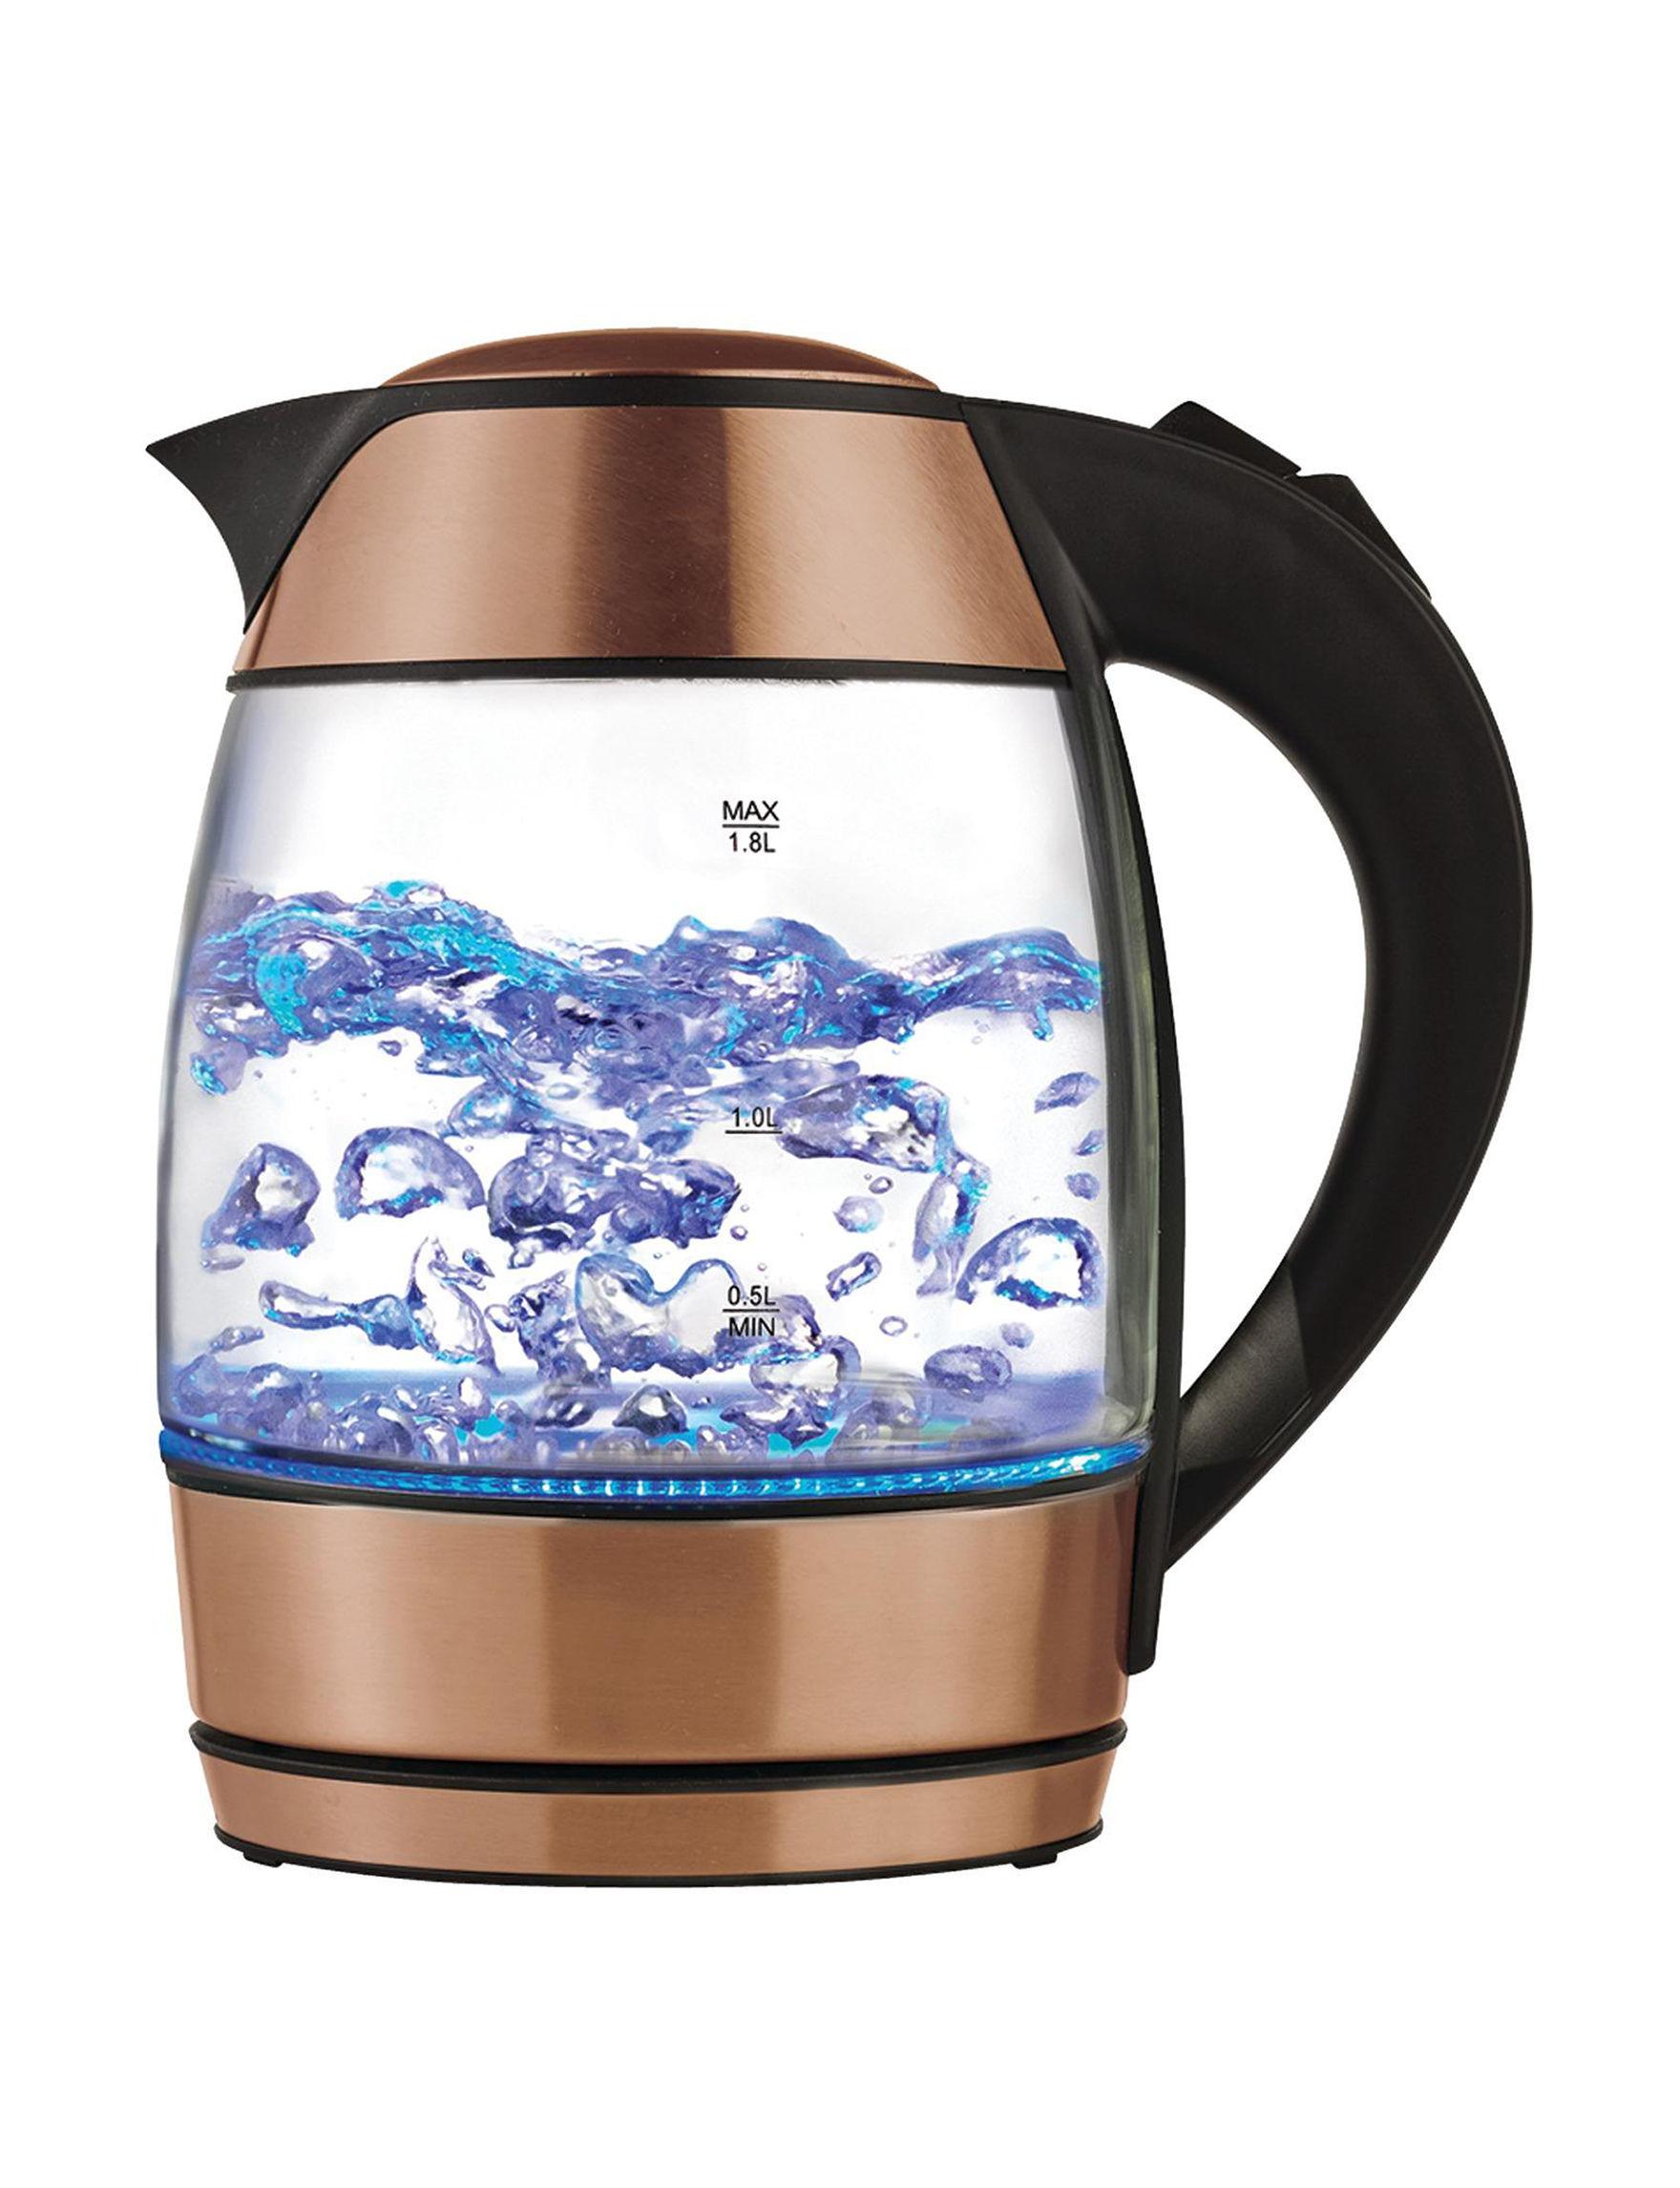 Brentwood  Coffee, Espresso & Tea Makers Kitchen Appliances